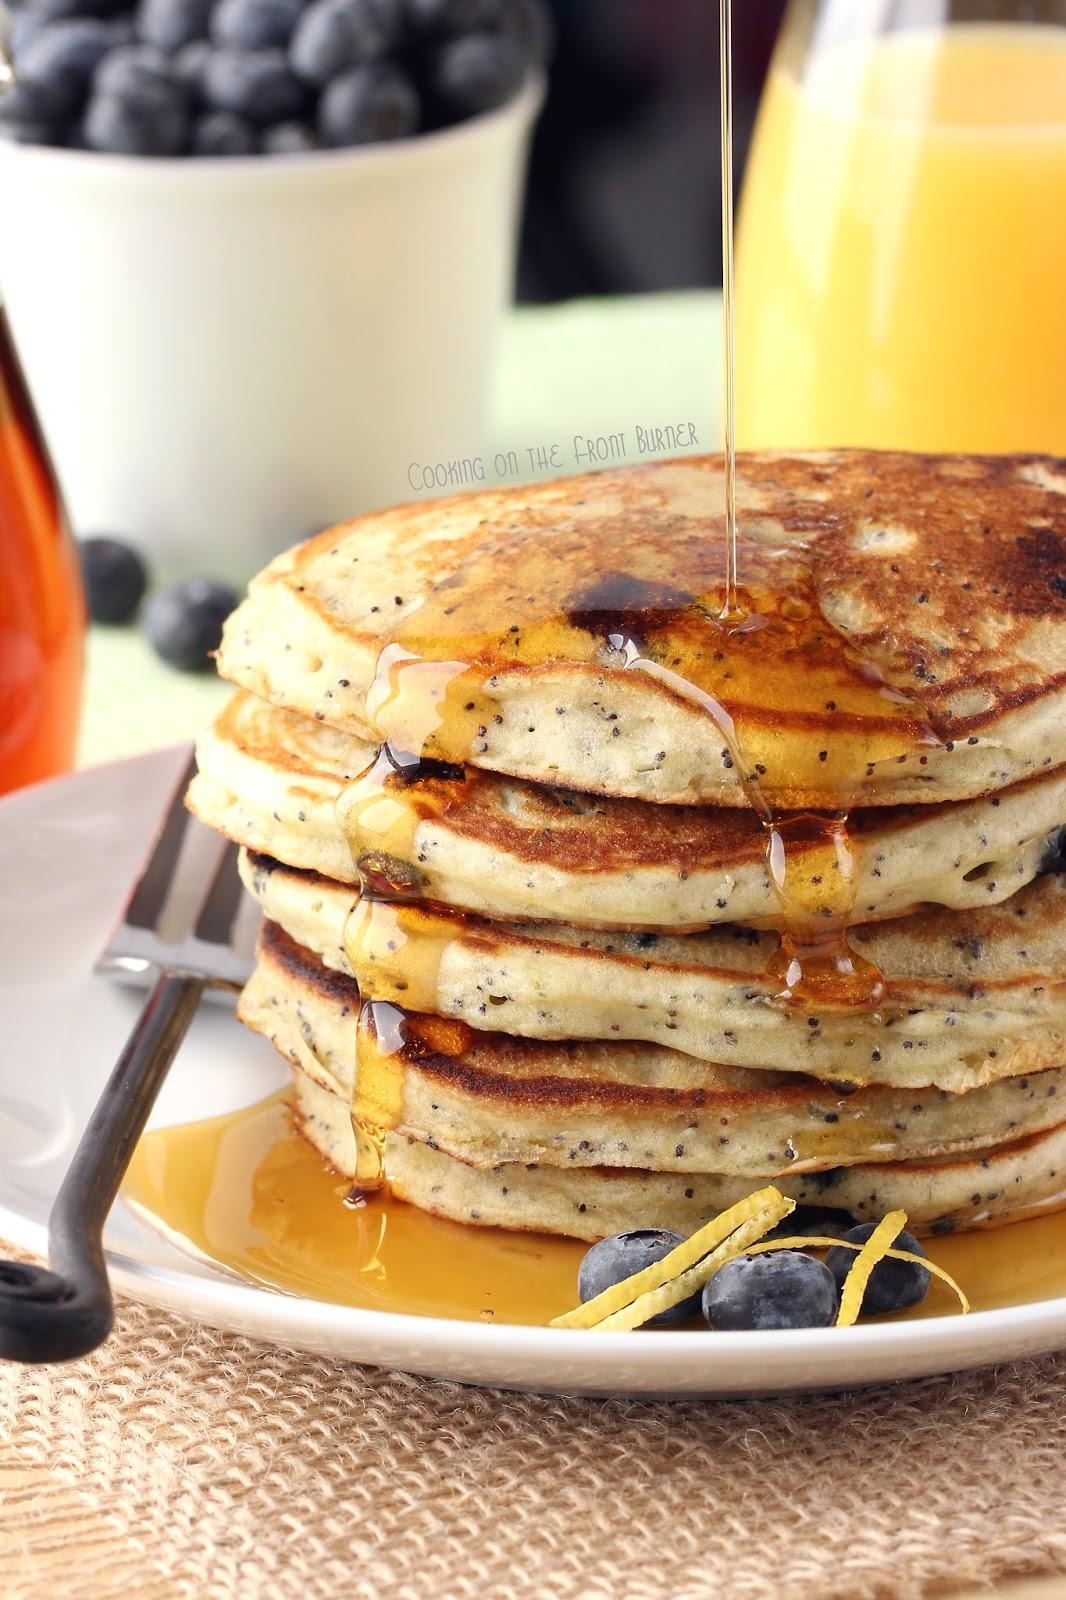 Lemon Blueberry Poppy Seed Pancakes | Cooking on the Front Burner #poppyseepancakes